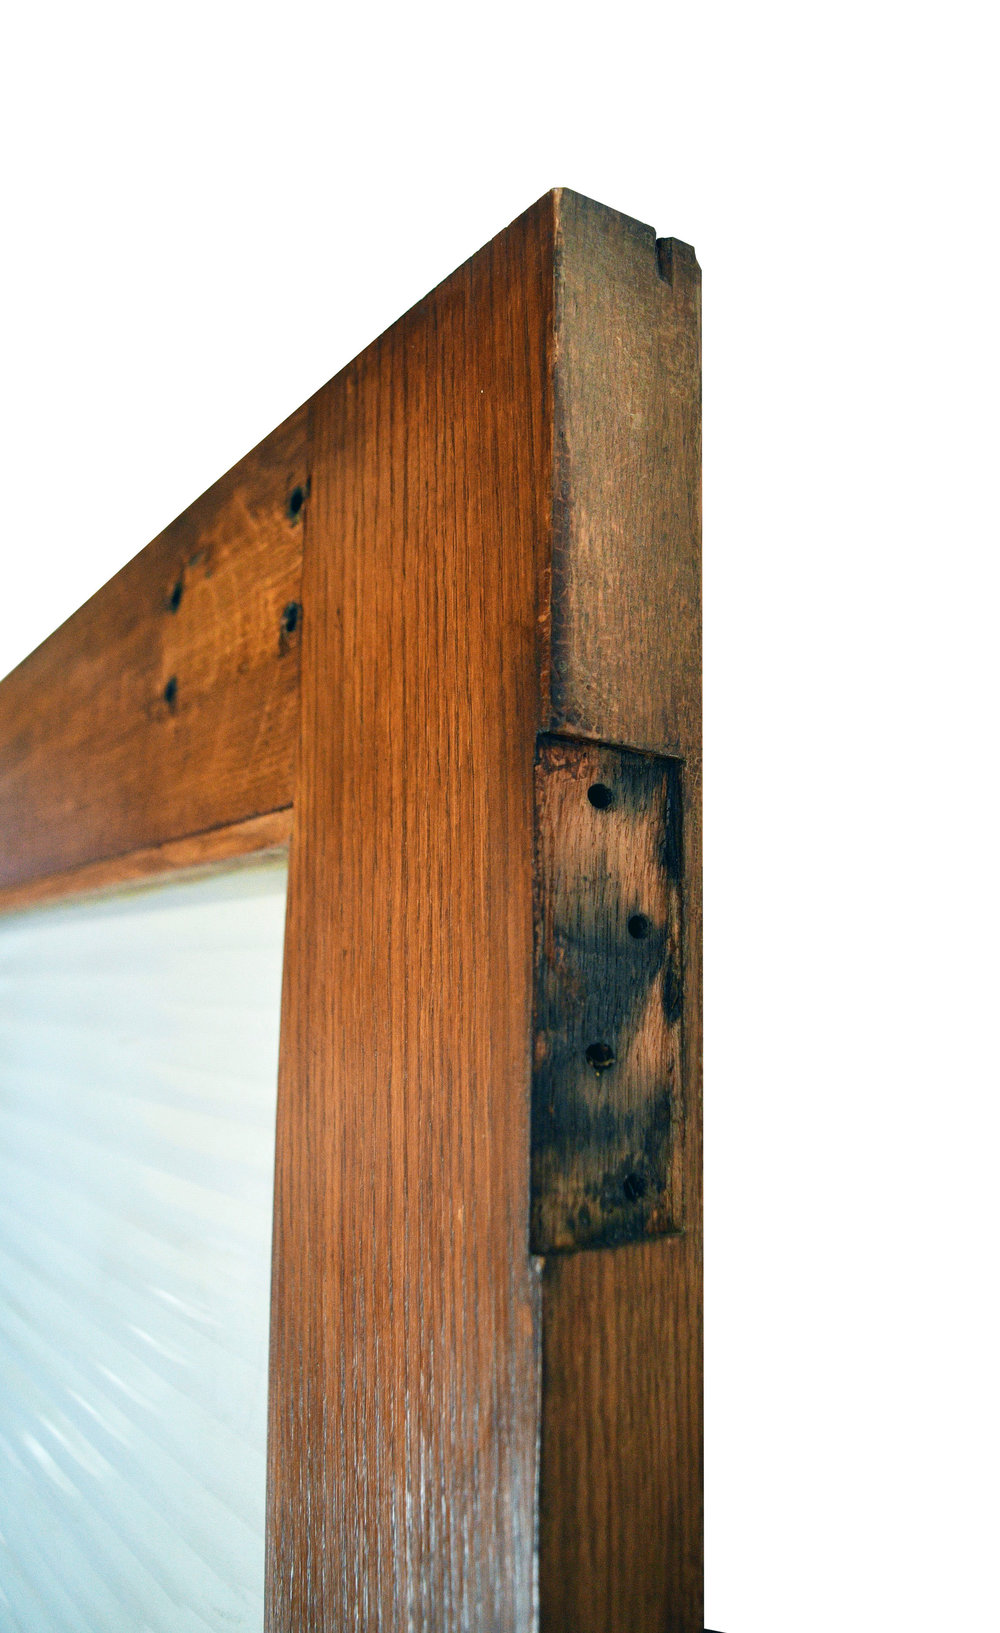 46160-quartersawn-ribbed-half-view-door-hinge-detail.jpg